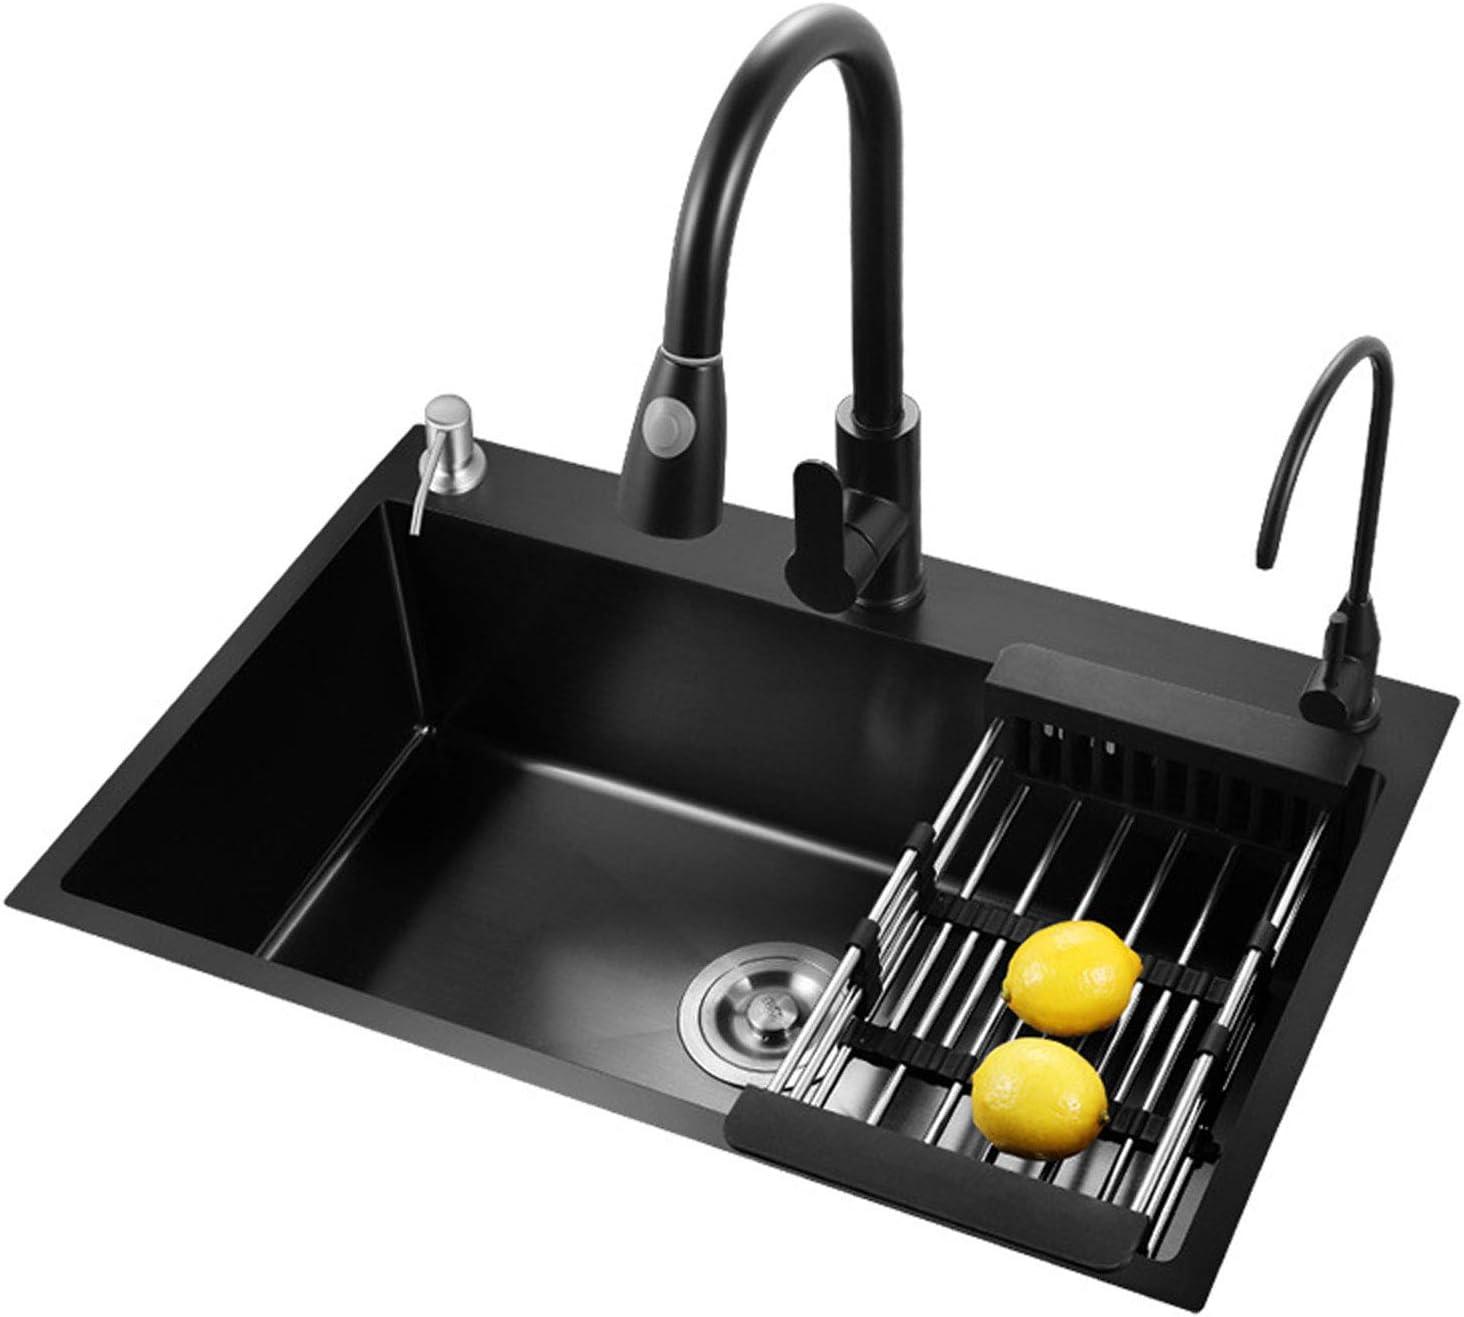 MLMQ Fregadero de Cocina Negro, Fregadero Empotrado Acero Inoxidable con Sifón Automático Dispensador de Jabón Escurridor, Lavabo Cocina Encimera o Enrasado,With tap,65X45cm